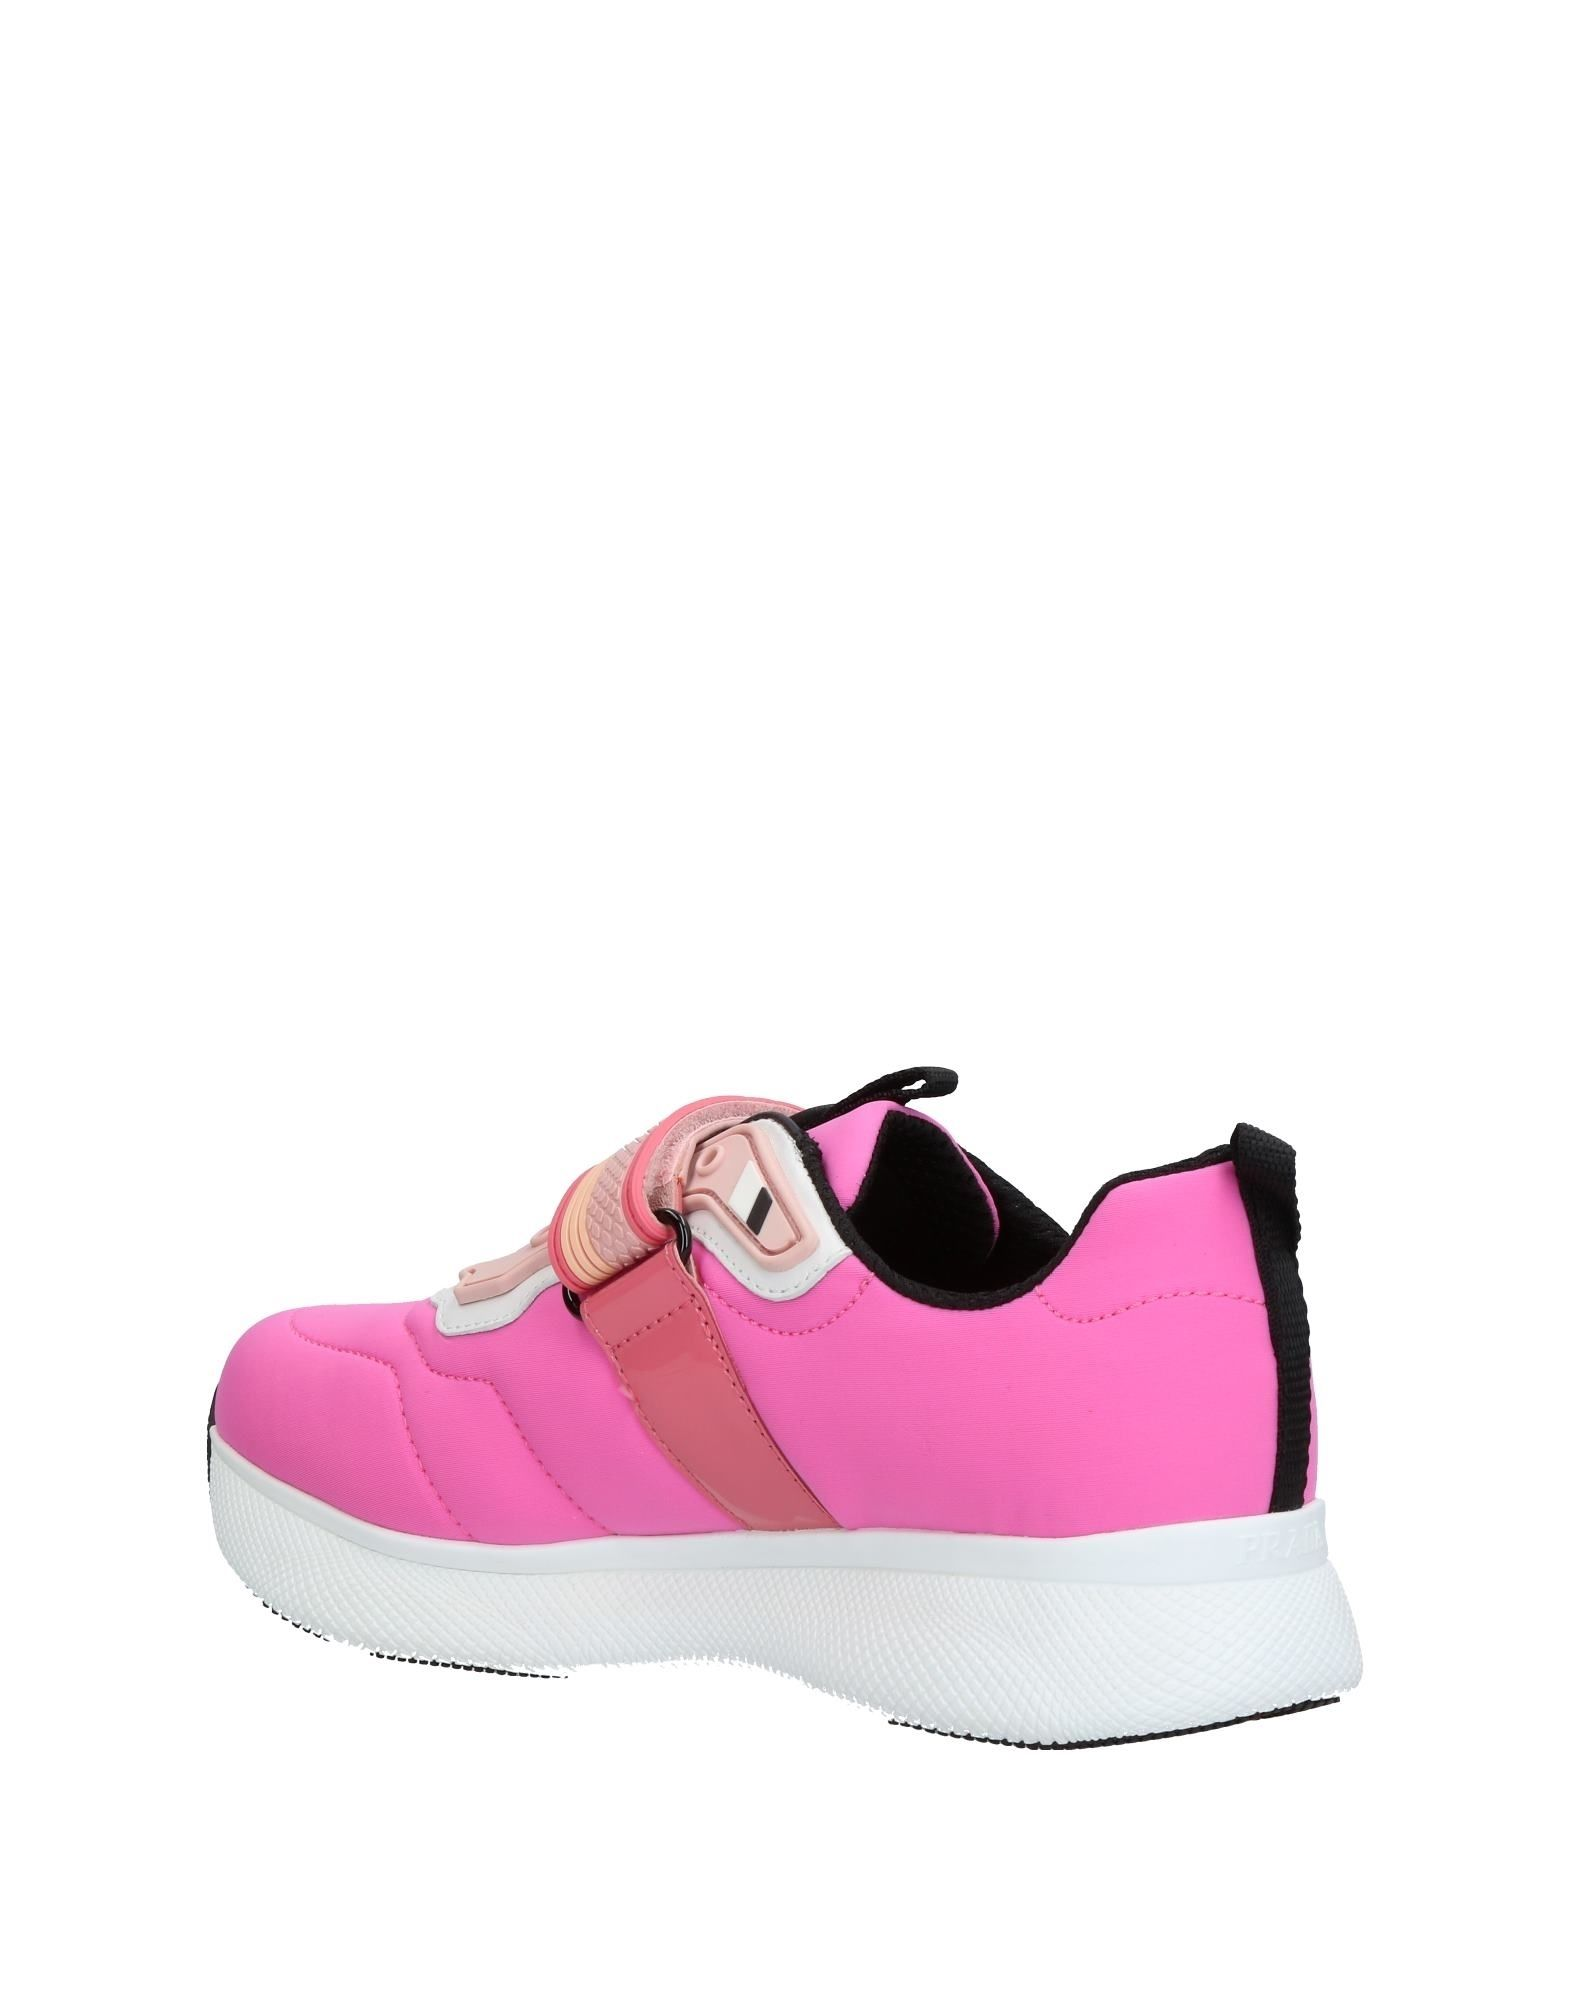 7ec97f20c38c ... Sneakers Prada Sport Femme - Sneakers Prada Sport sur ...